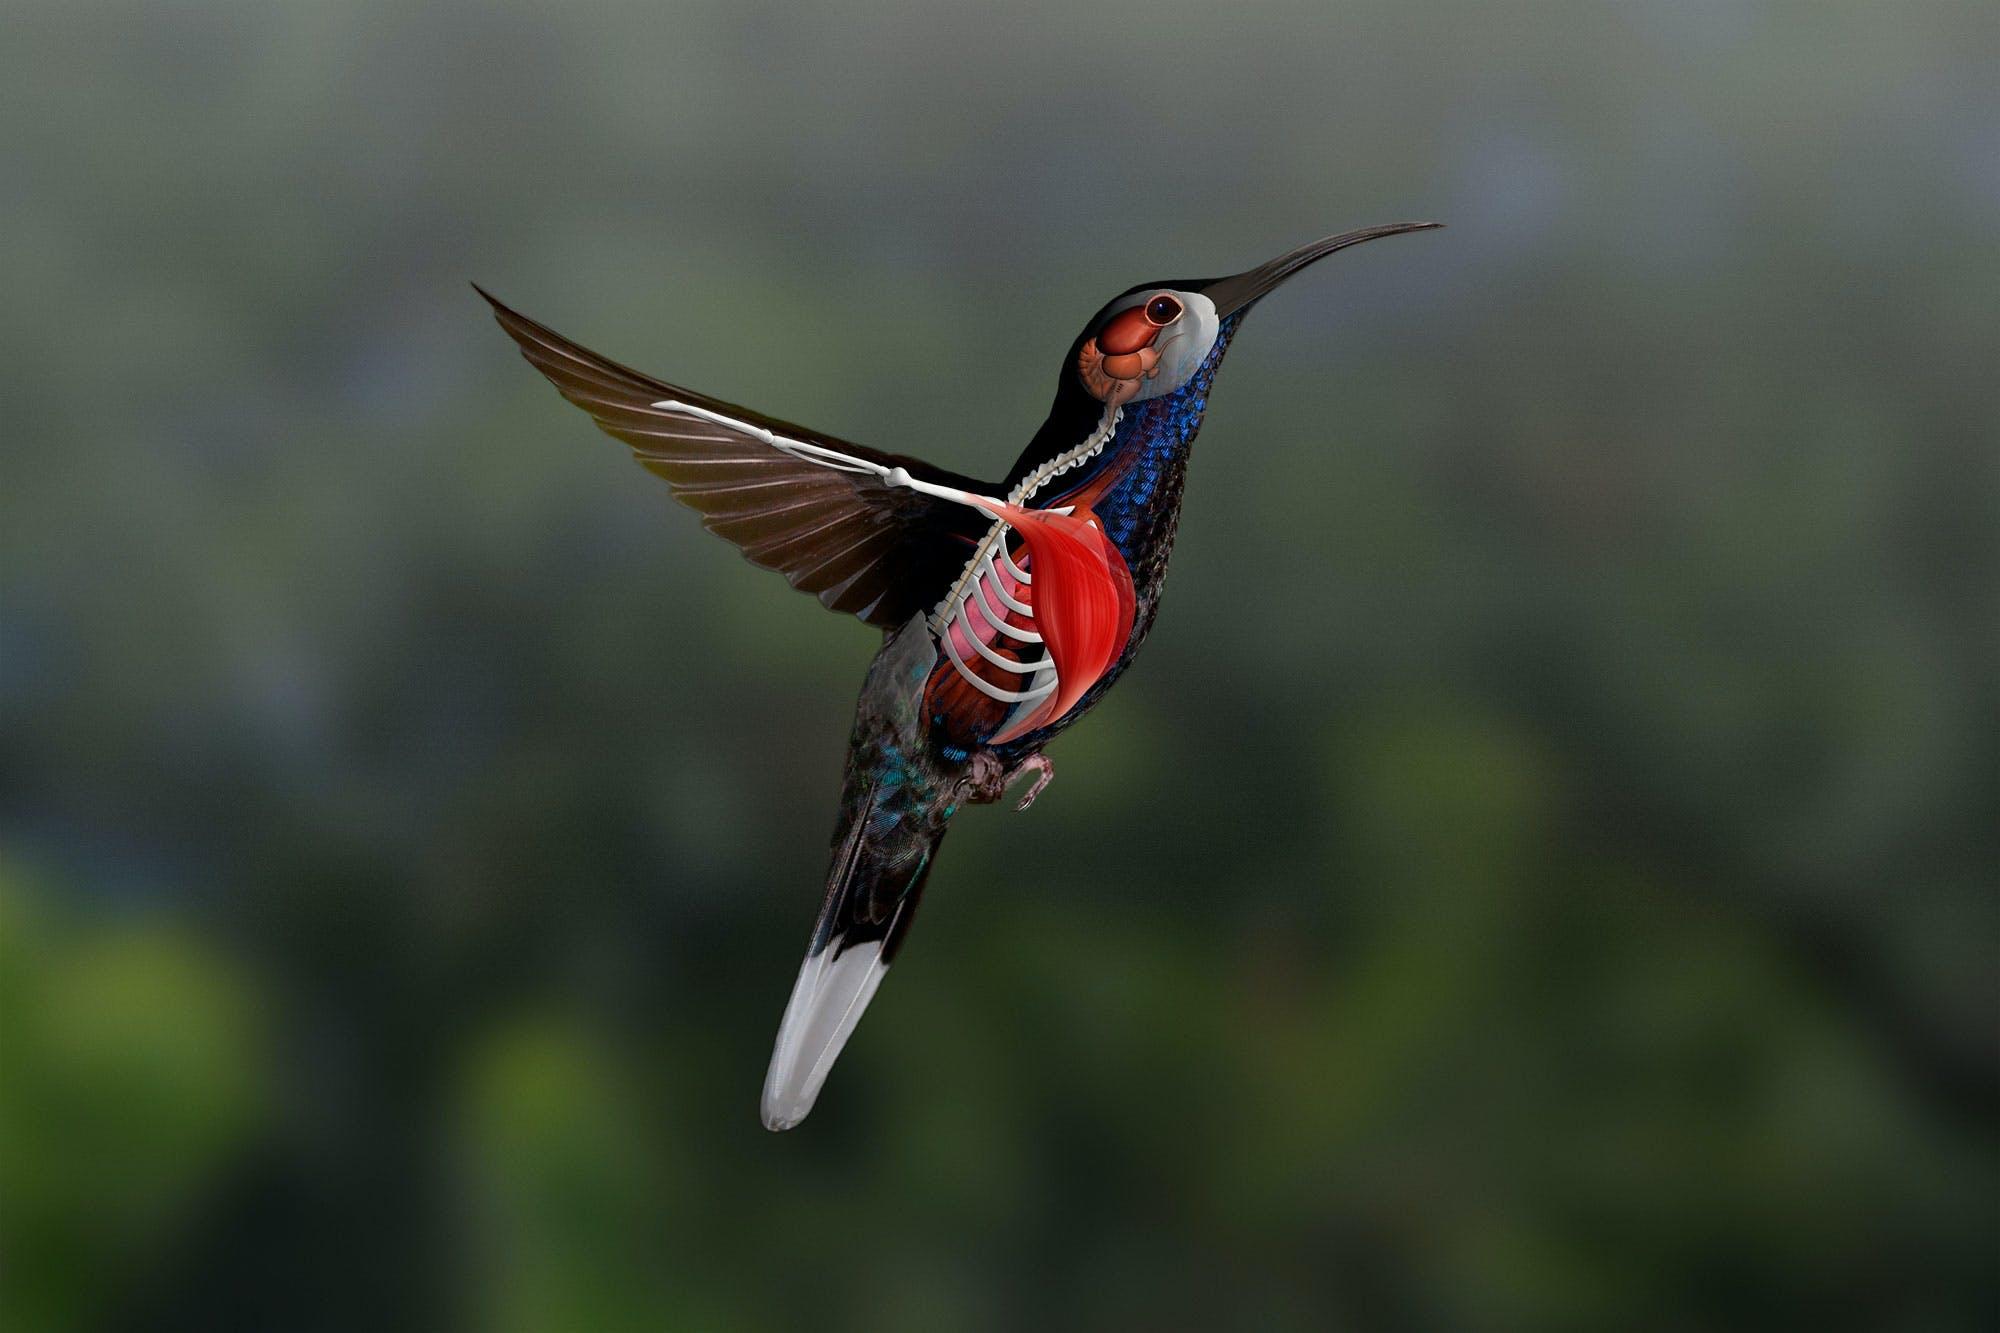 Kolibriens fødder